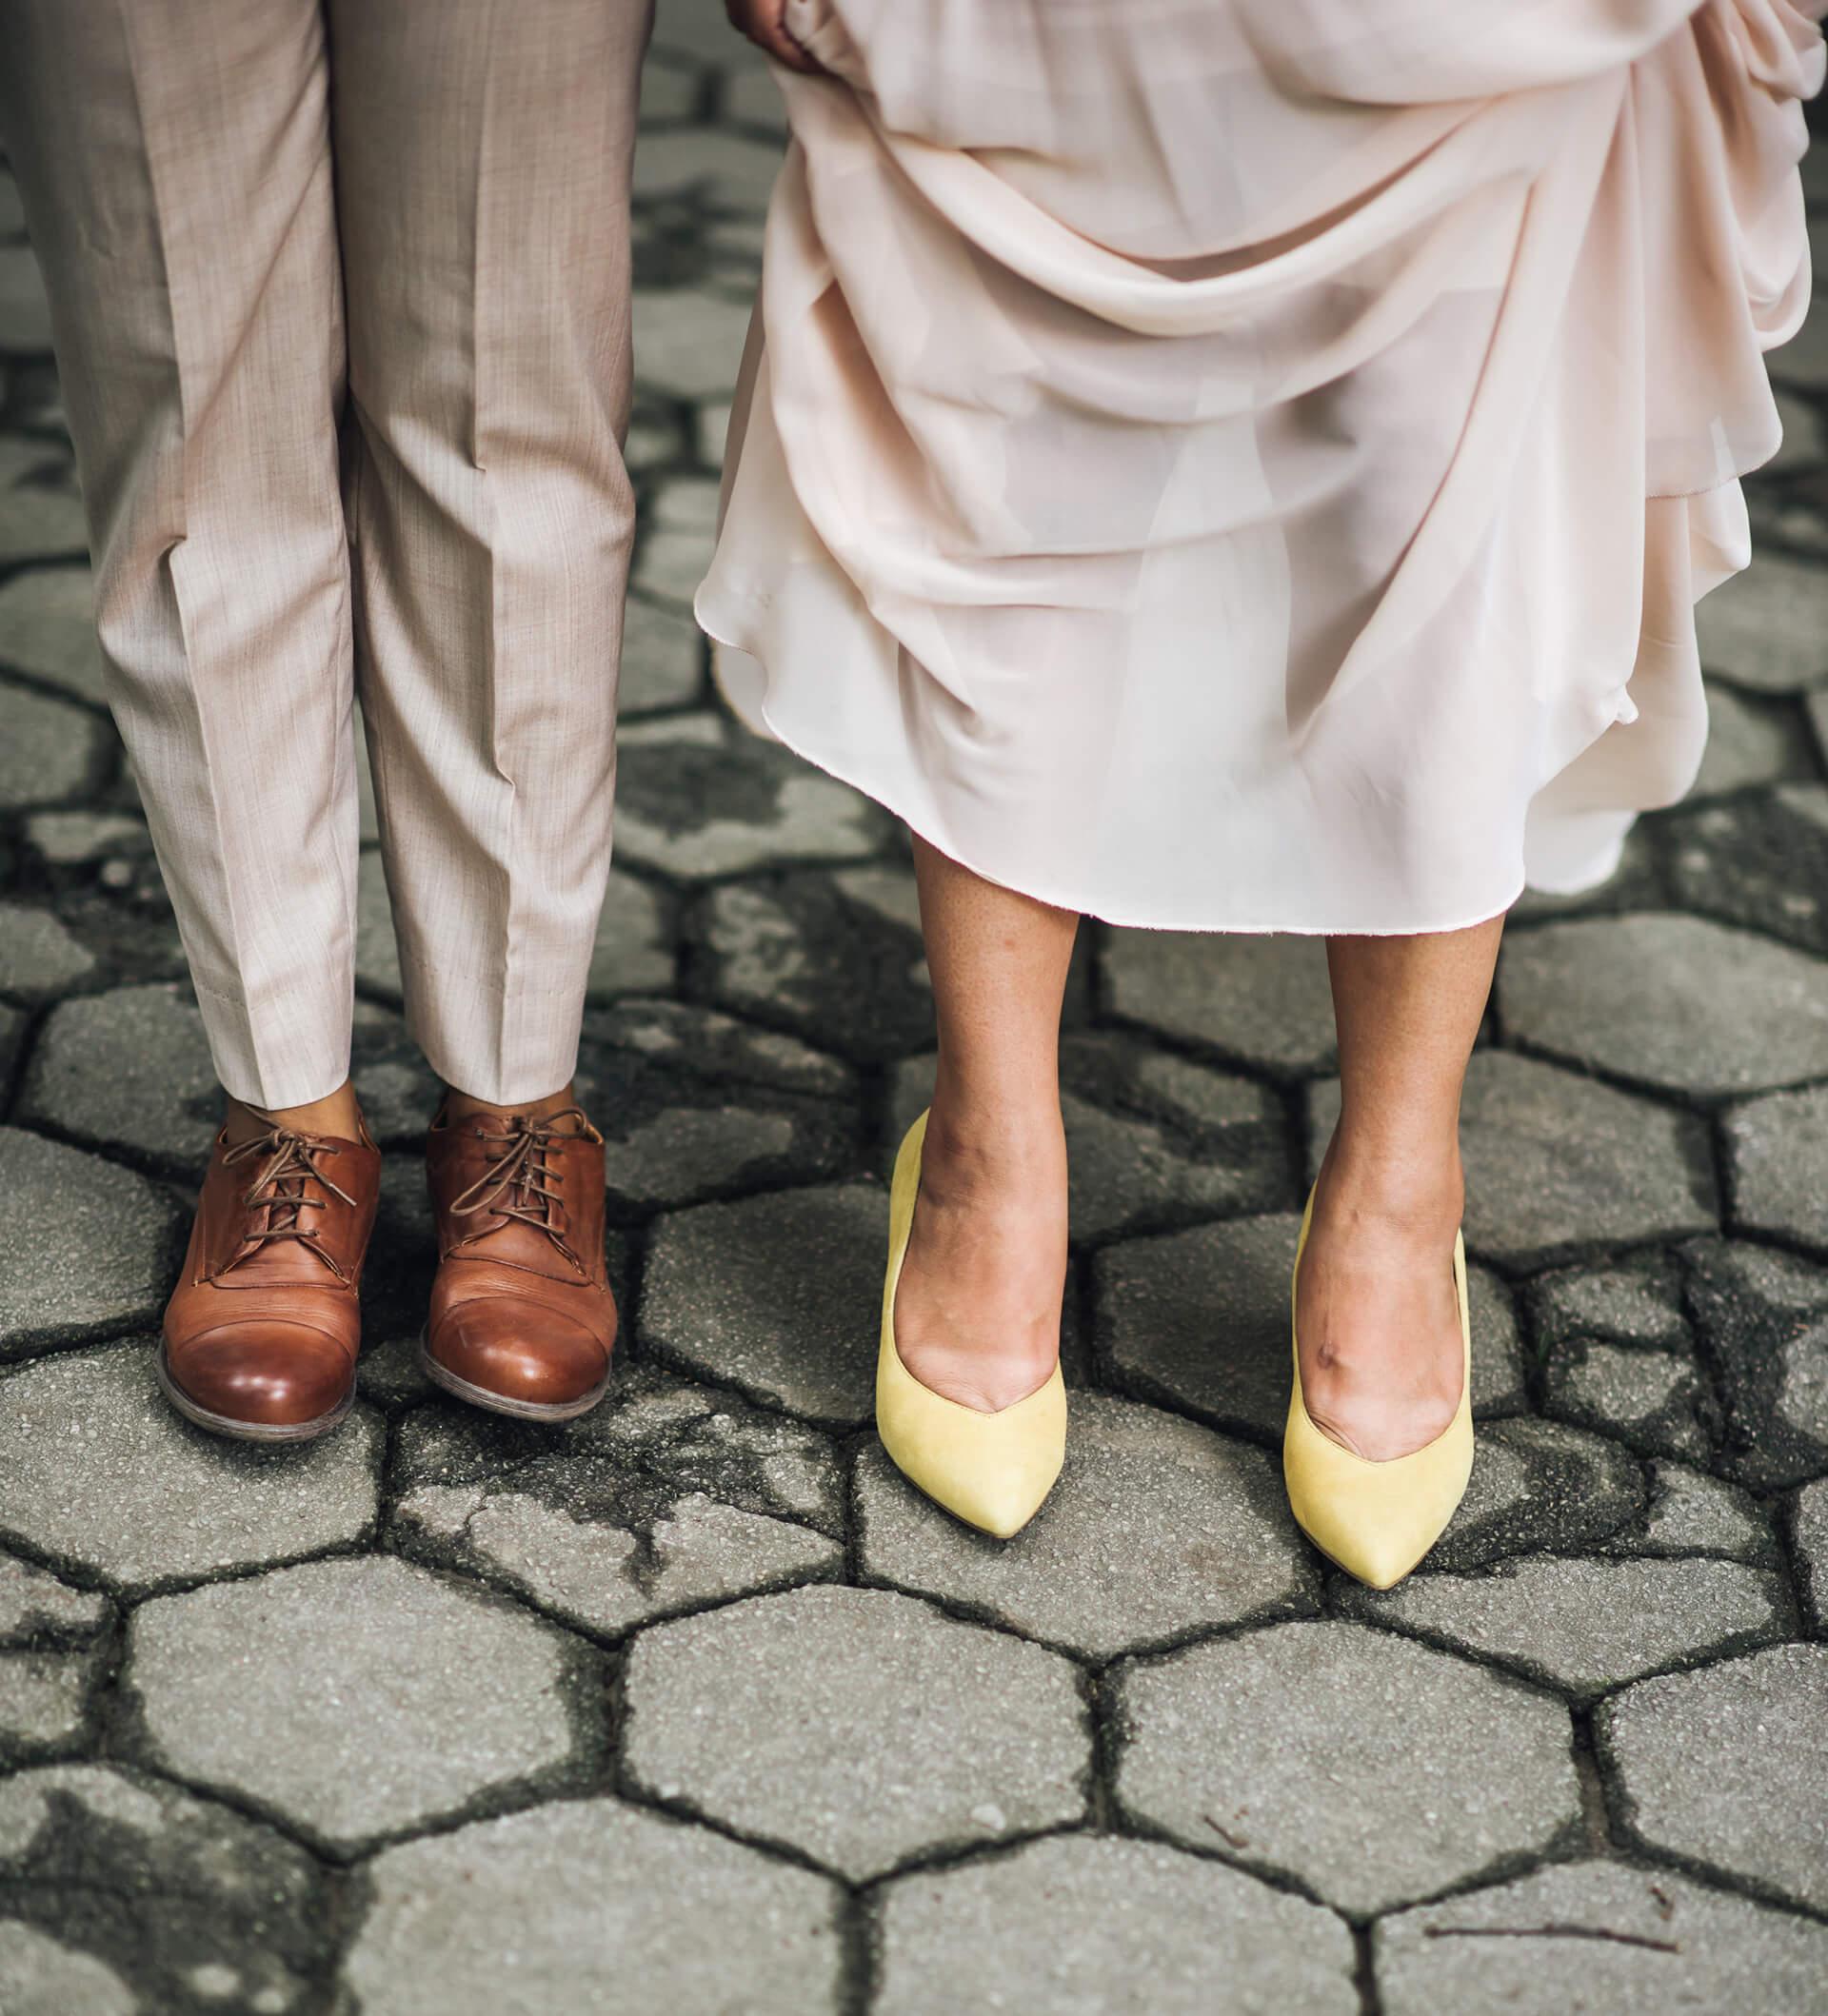 BROOKLYN SOCIETY FOR ETHICAL CULTURE - INTIMATE WEDDING - CHI-CHI ARI-128.jpg